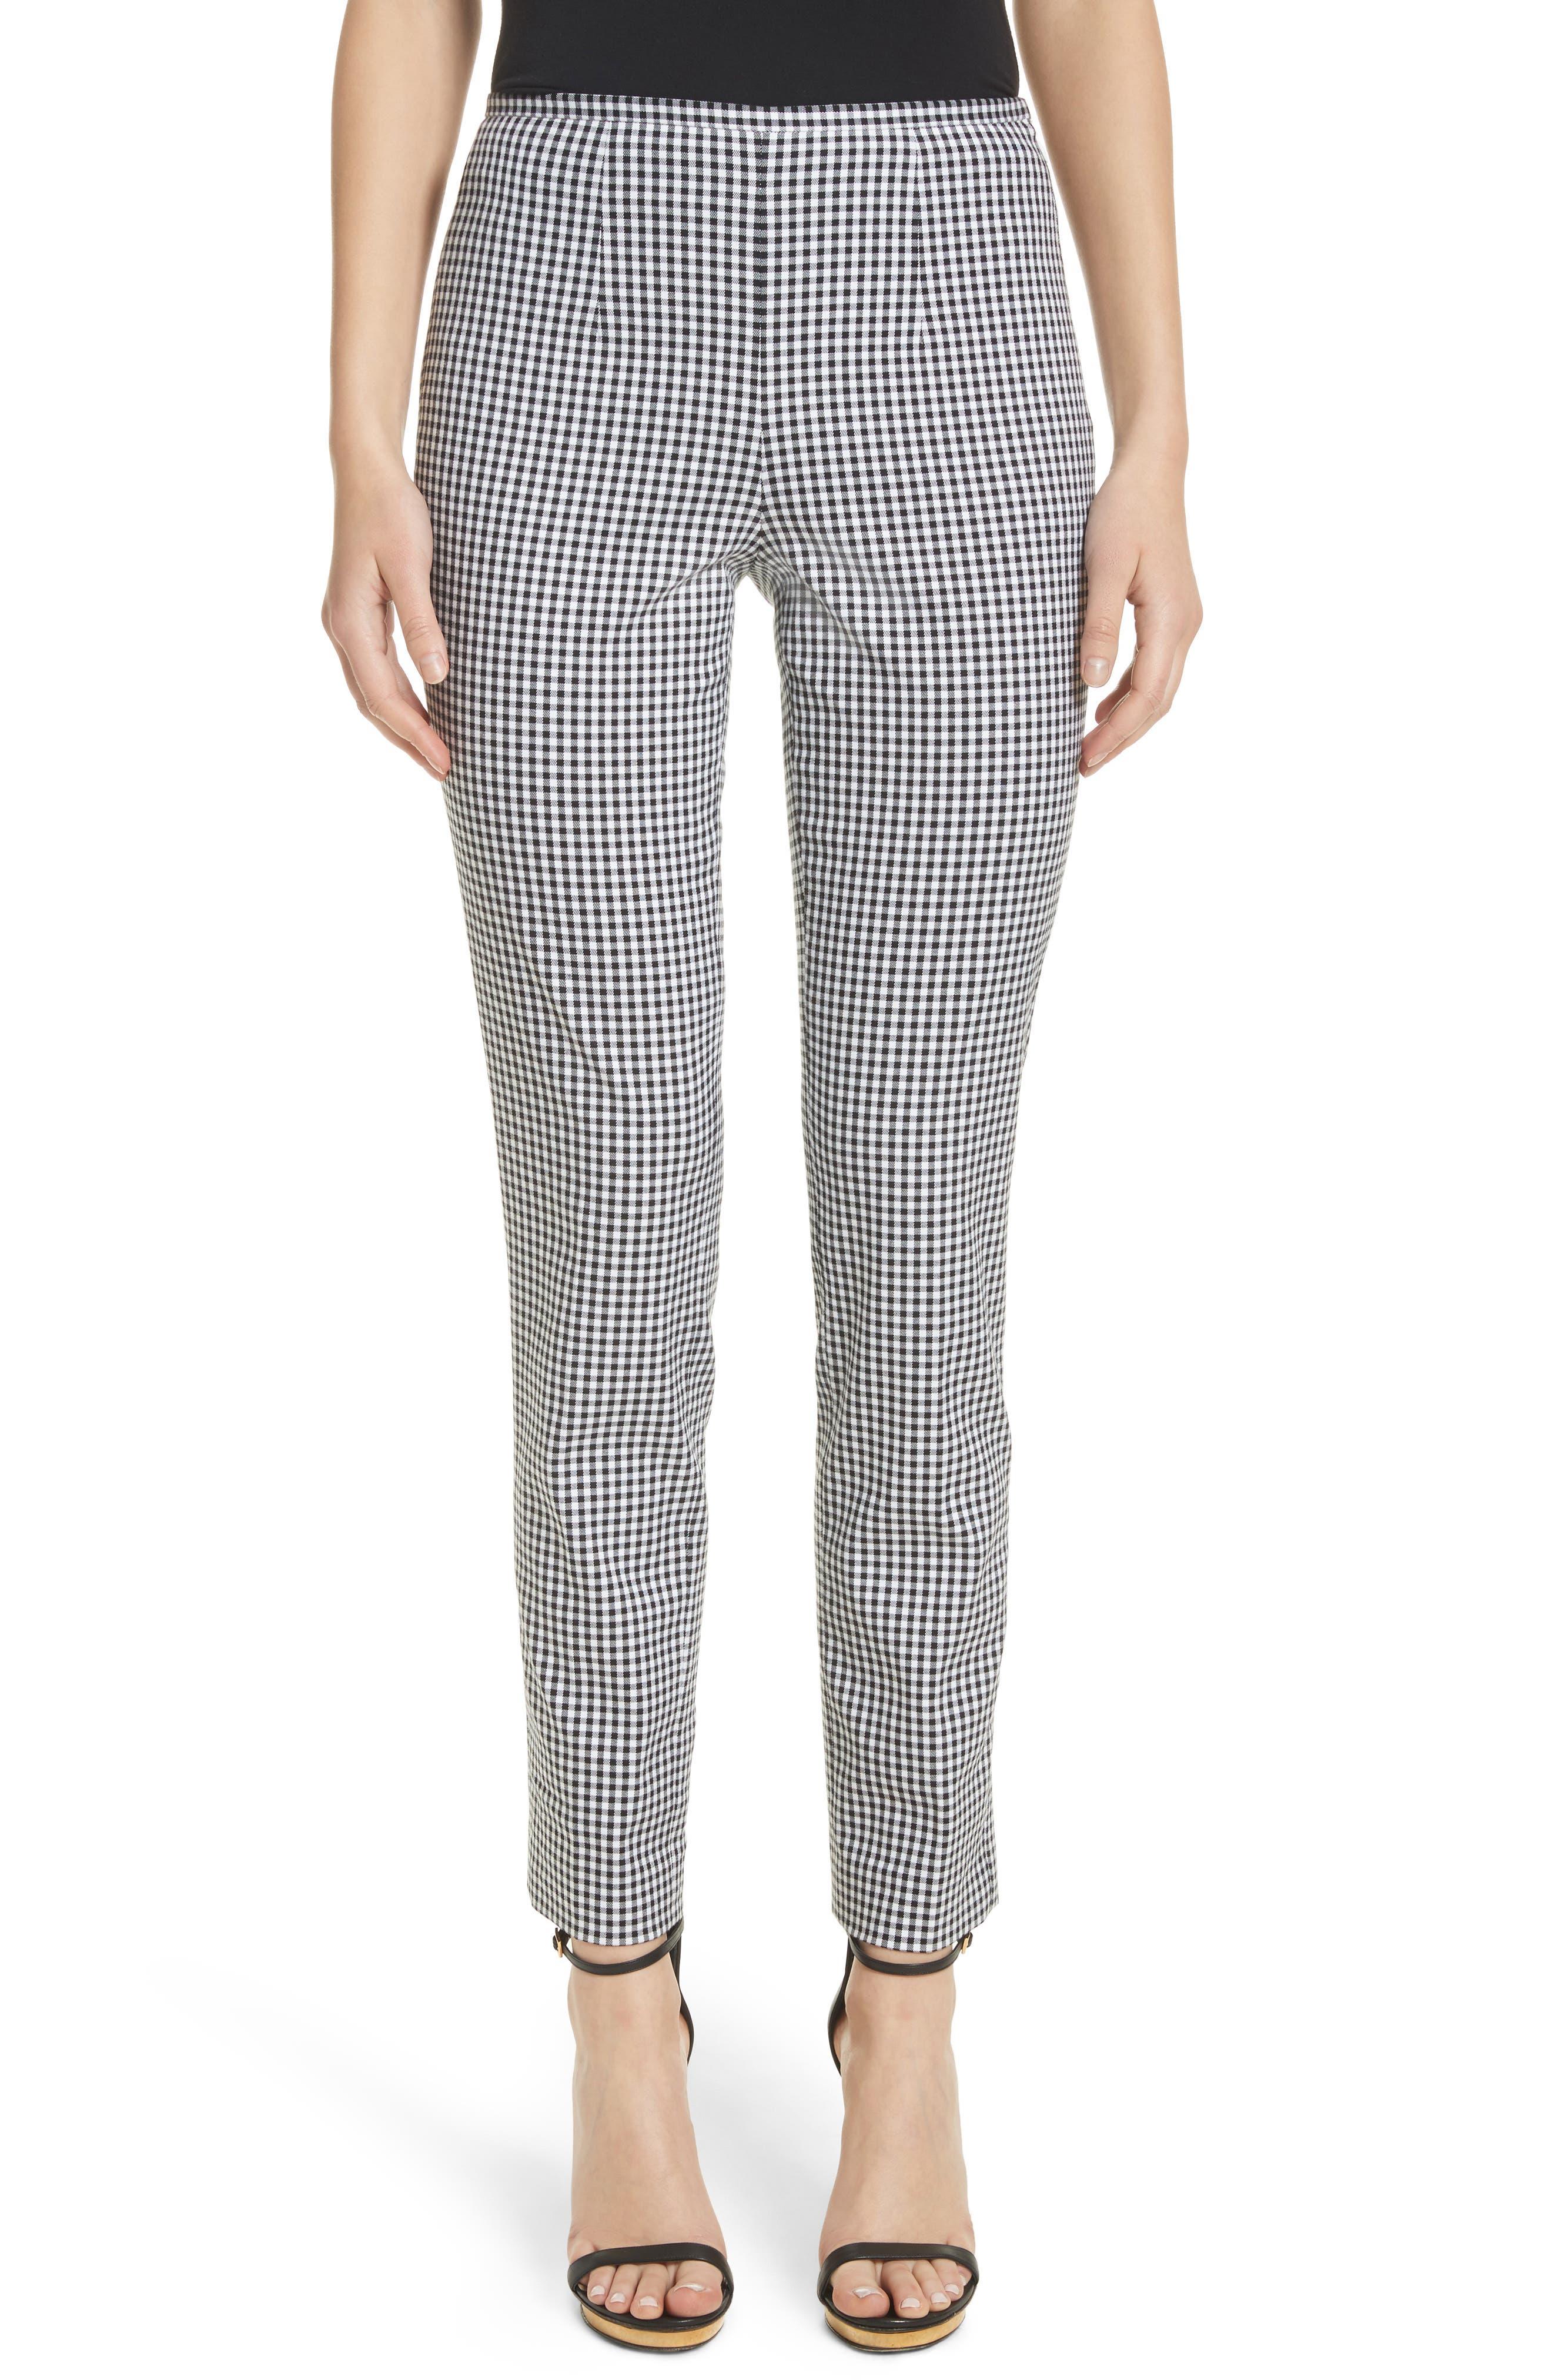 Gingham Stretch Cotton Pants,                             Main thumbnail 1, color,                             Black / White